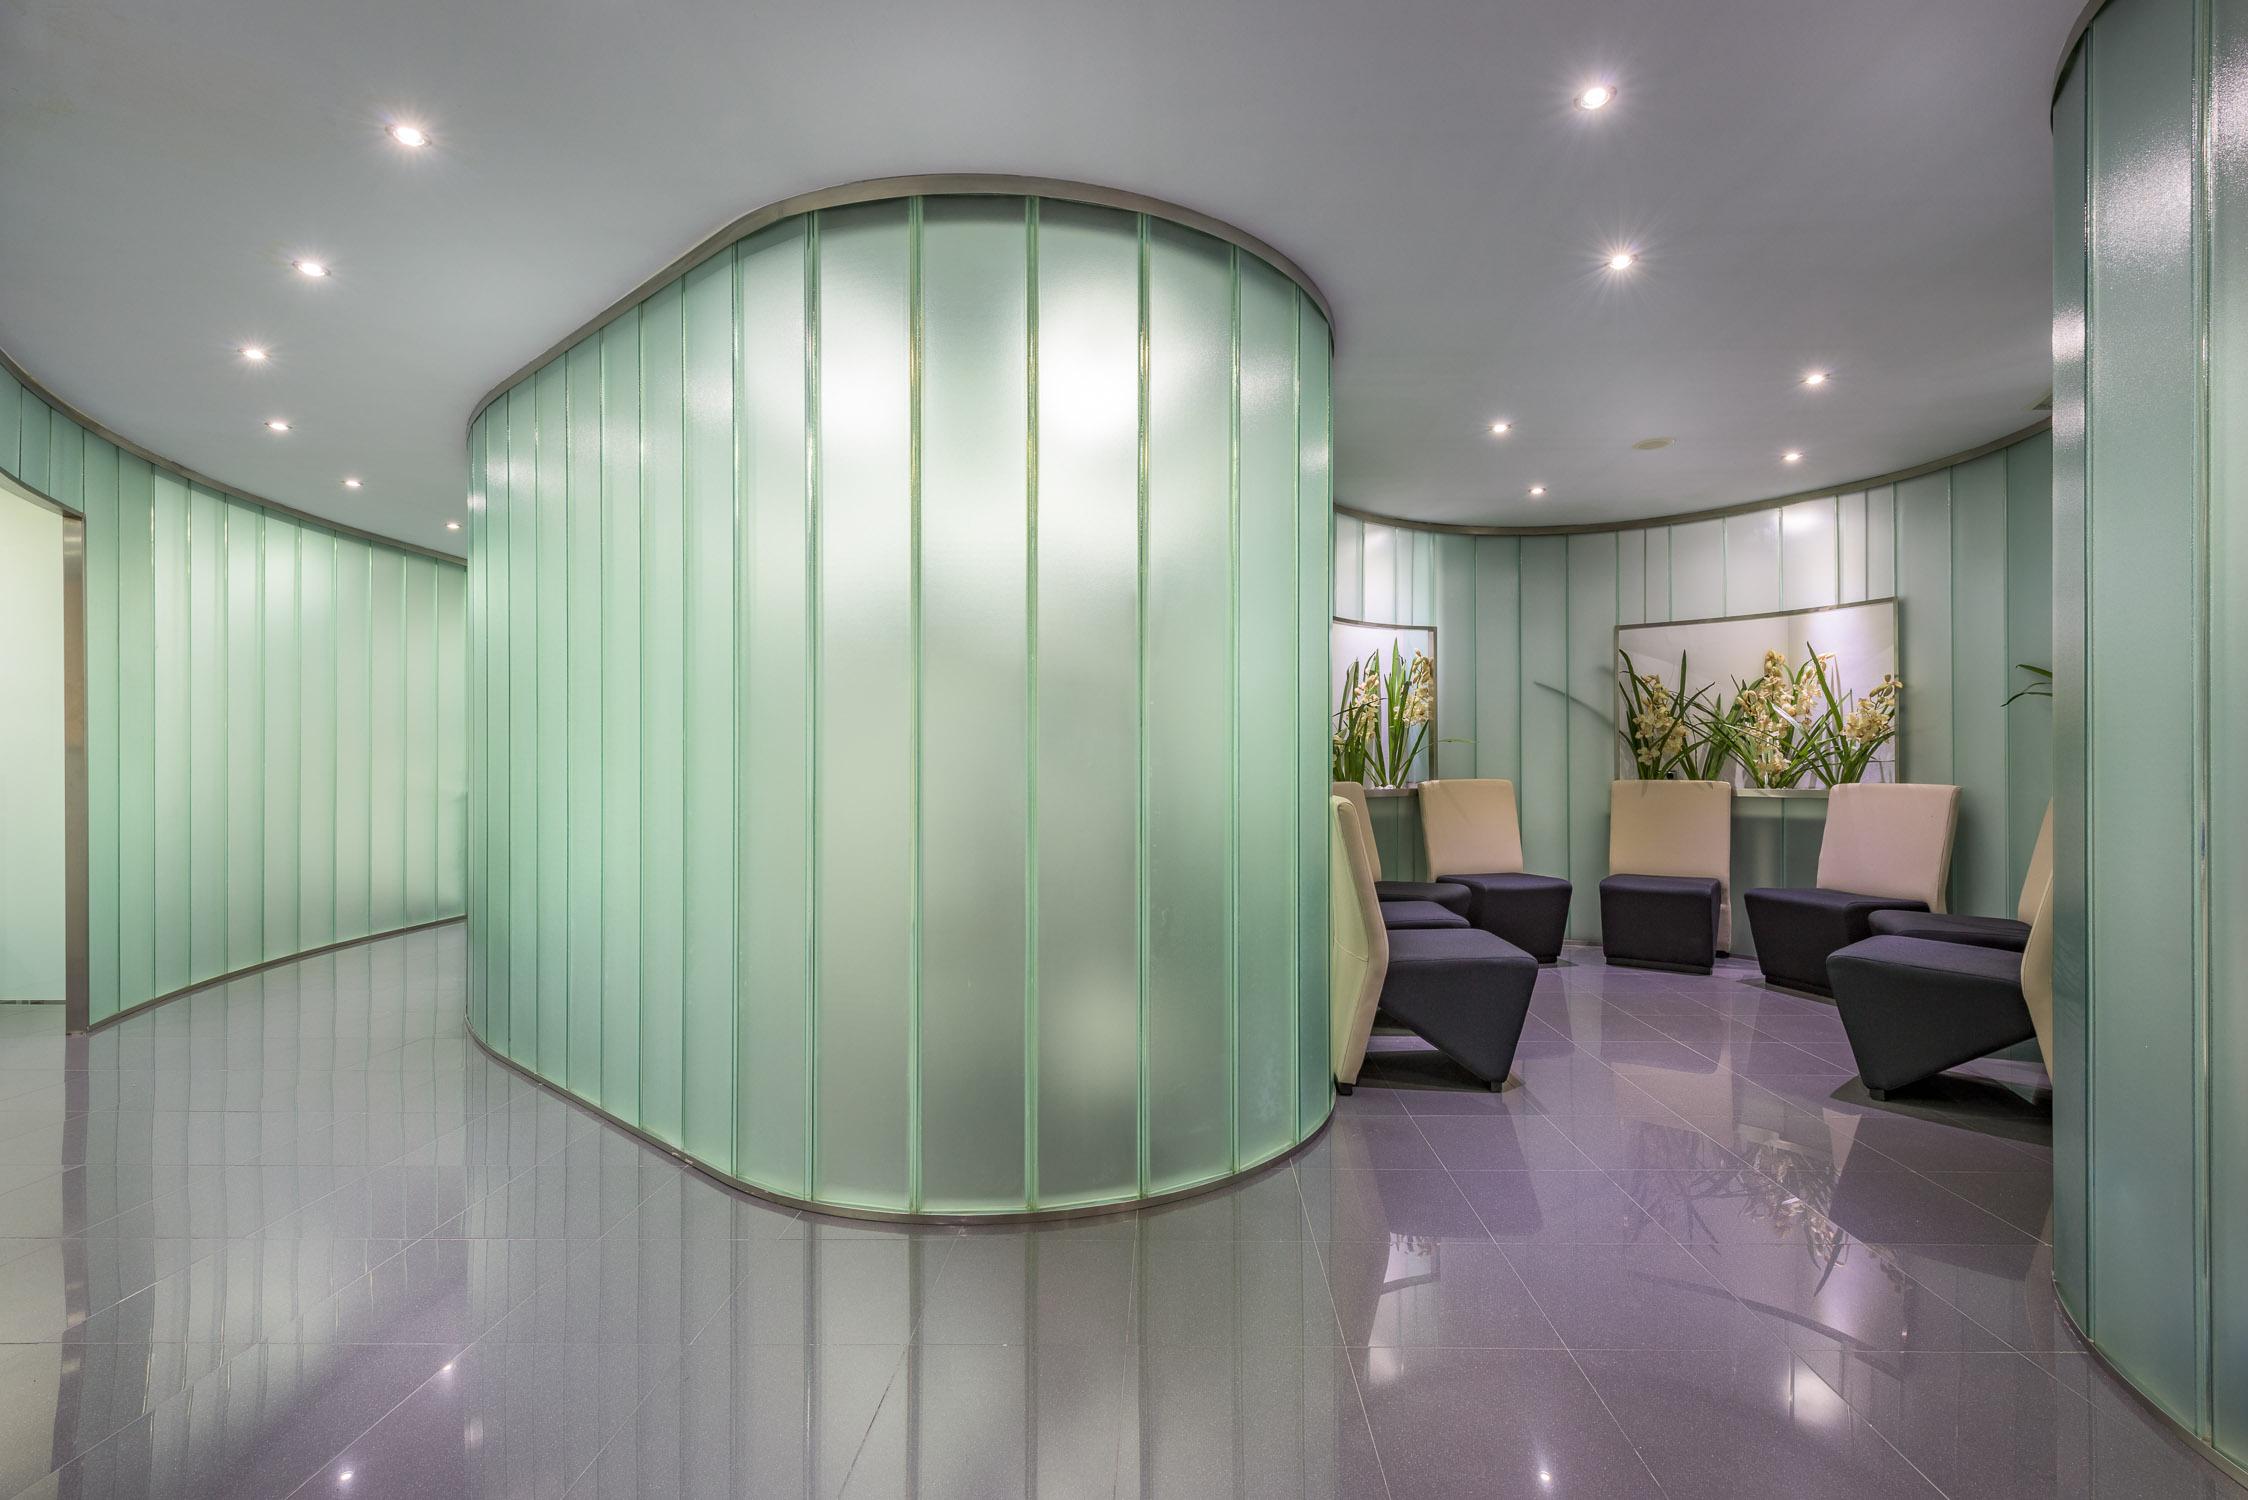 Clinica Dental Crooke & Laguna - Malaga